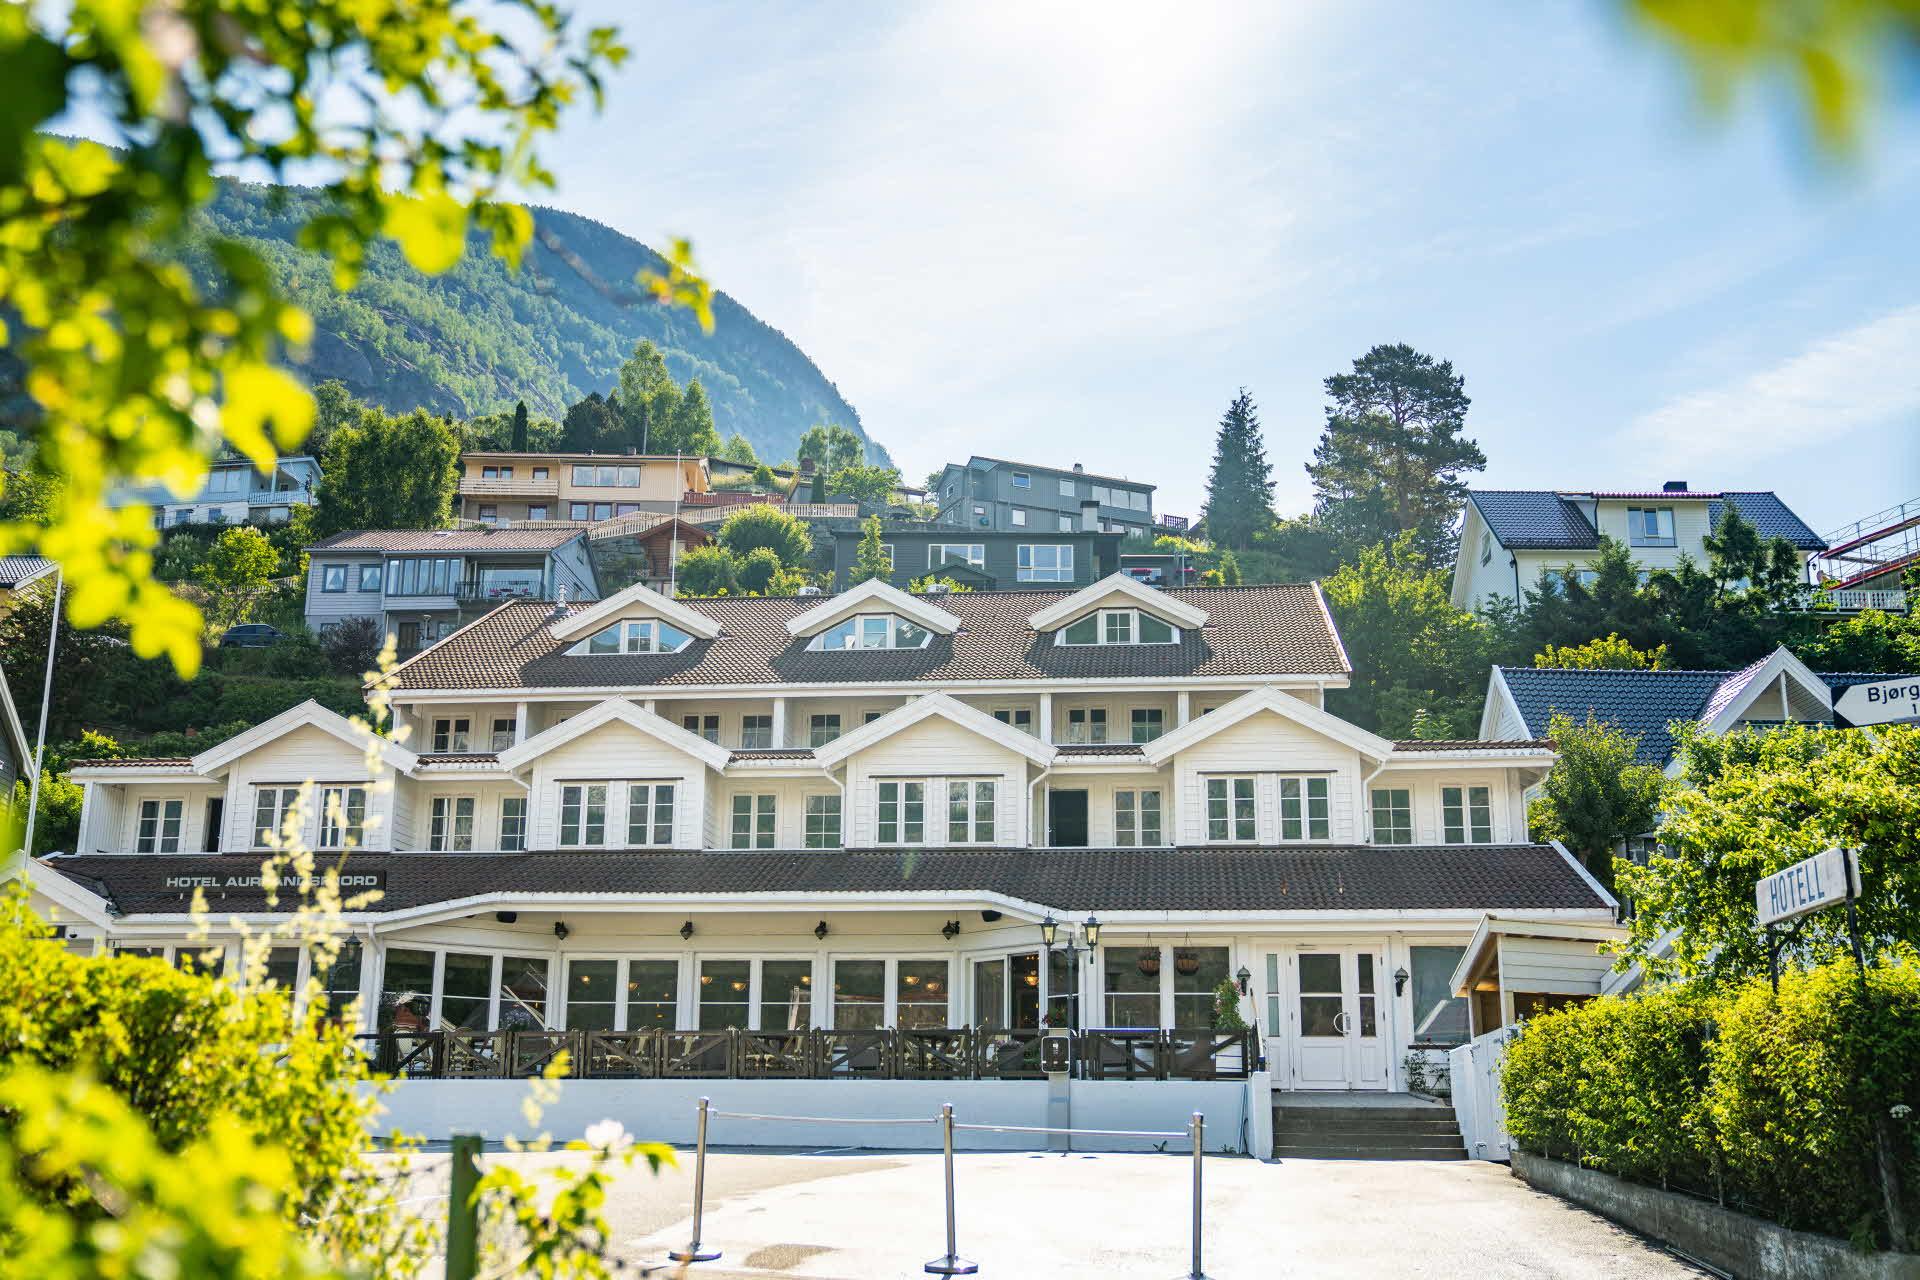 Hotel Aurlandsfjord sett fra vegen med terrasse og parkering foran